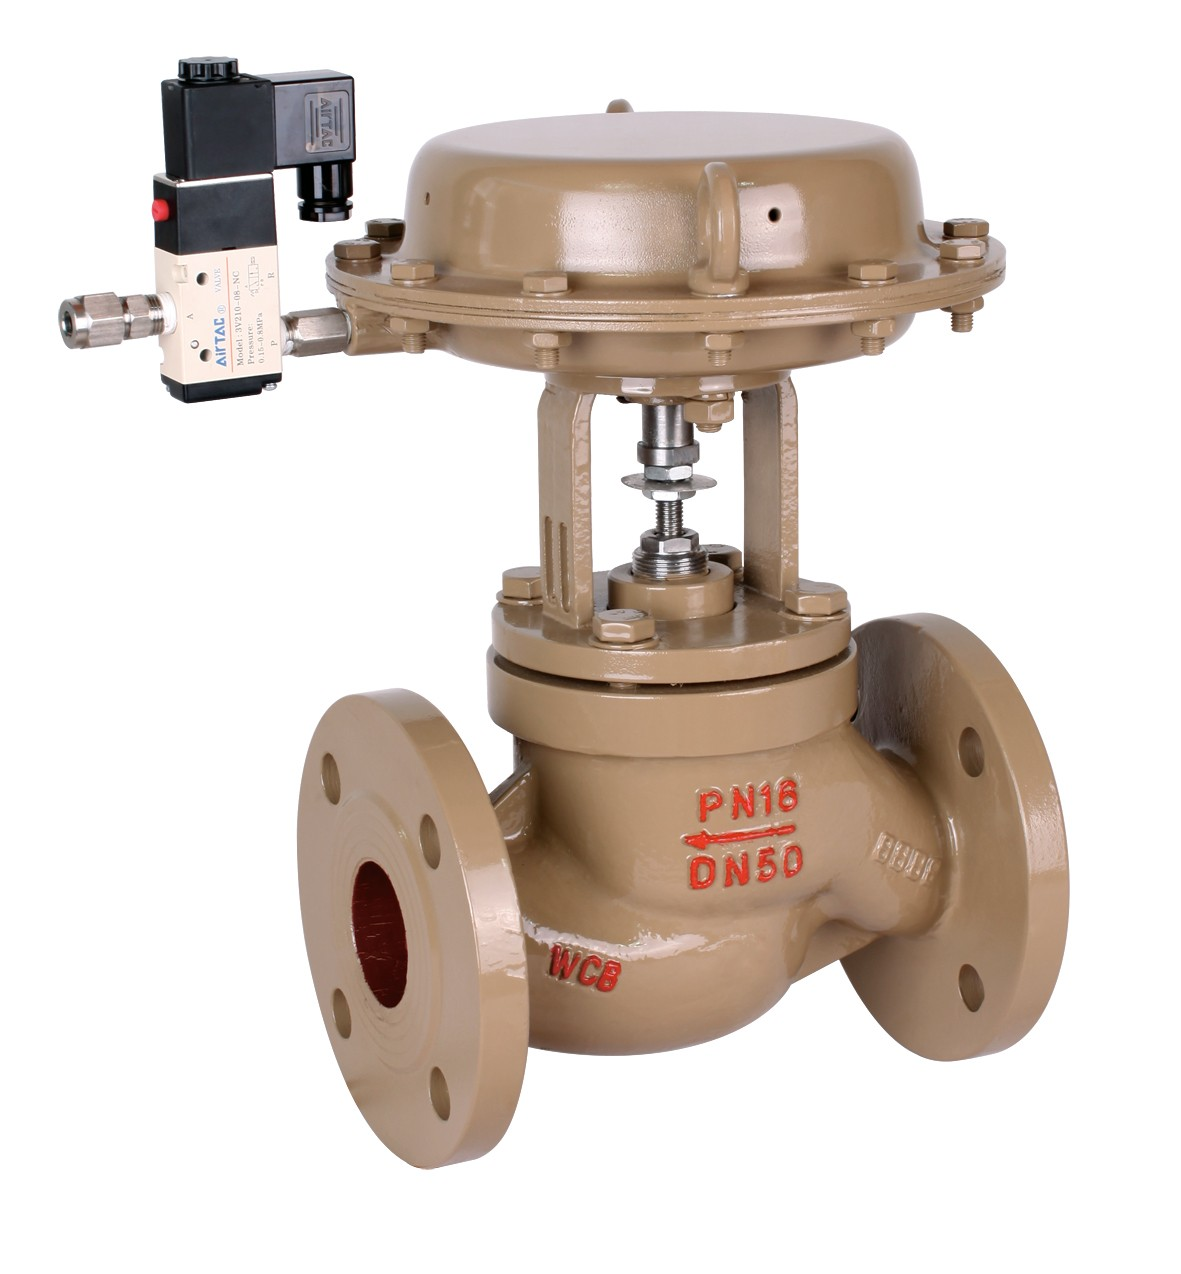 Pneumatic operated quick shut-off valve